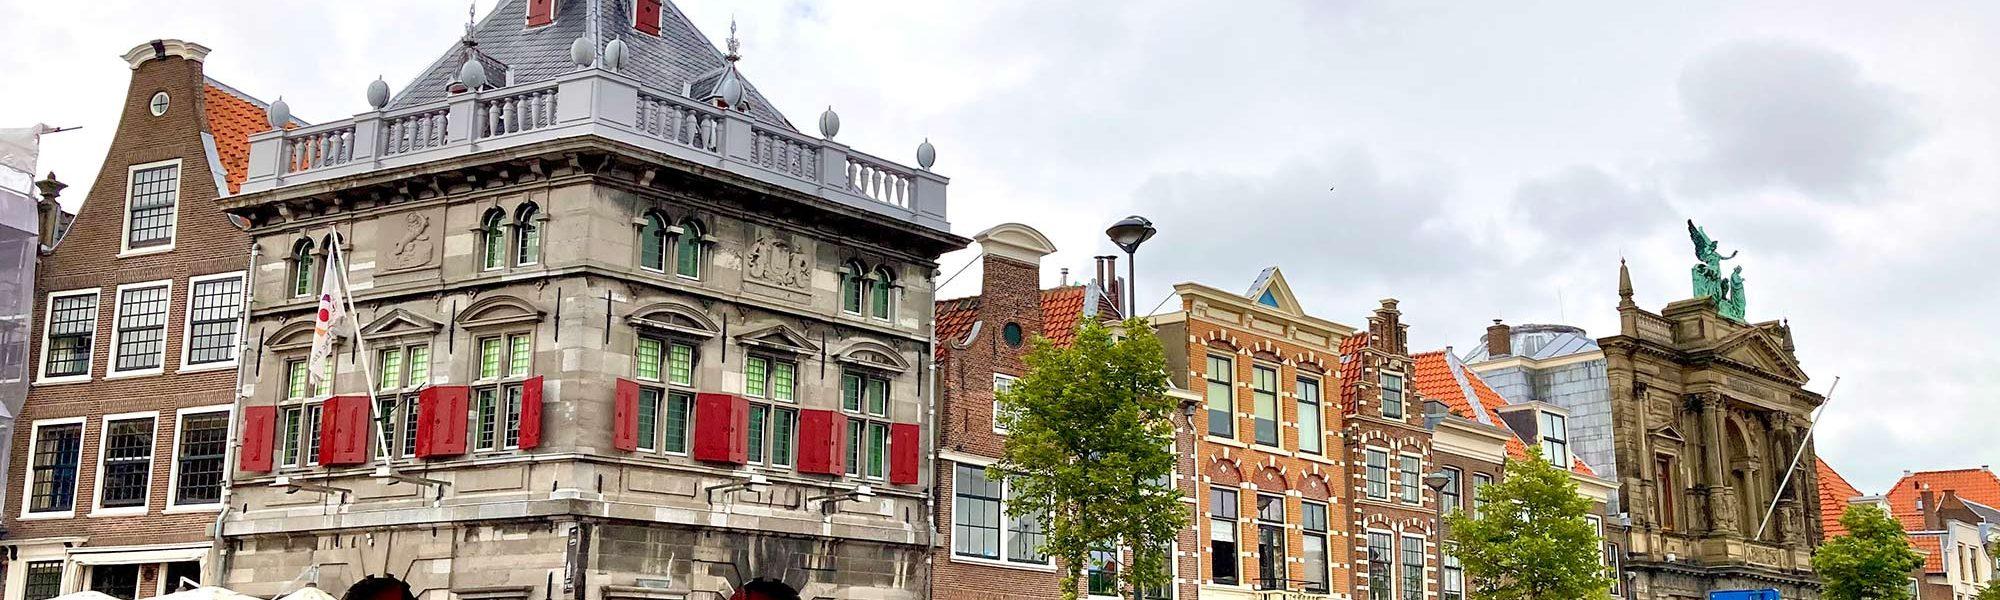 Haarlem-portada